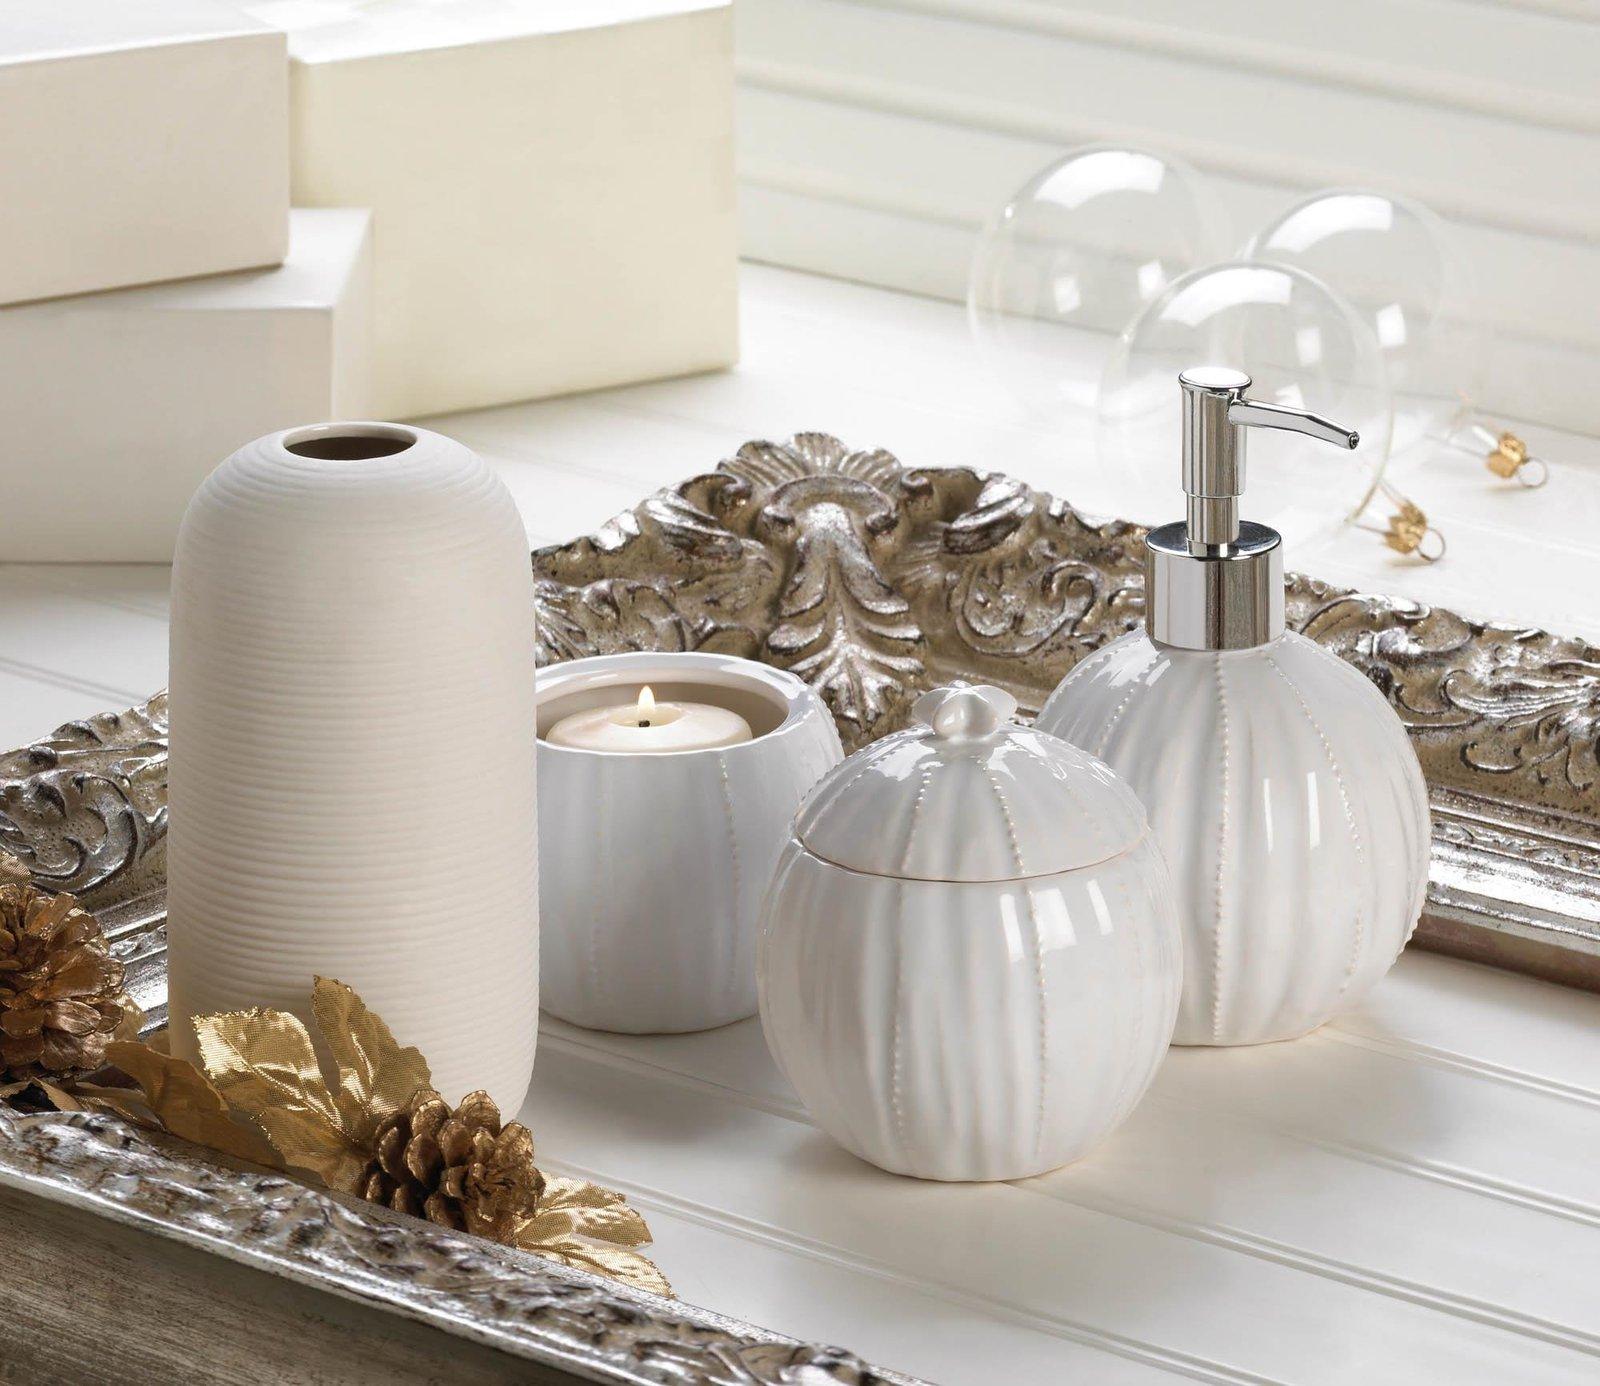 ... Container For Bathroom, Pure White Cotton Ball Food Tea Ceramic Jar  Decor ...